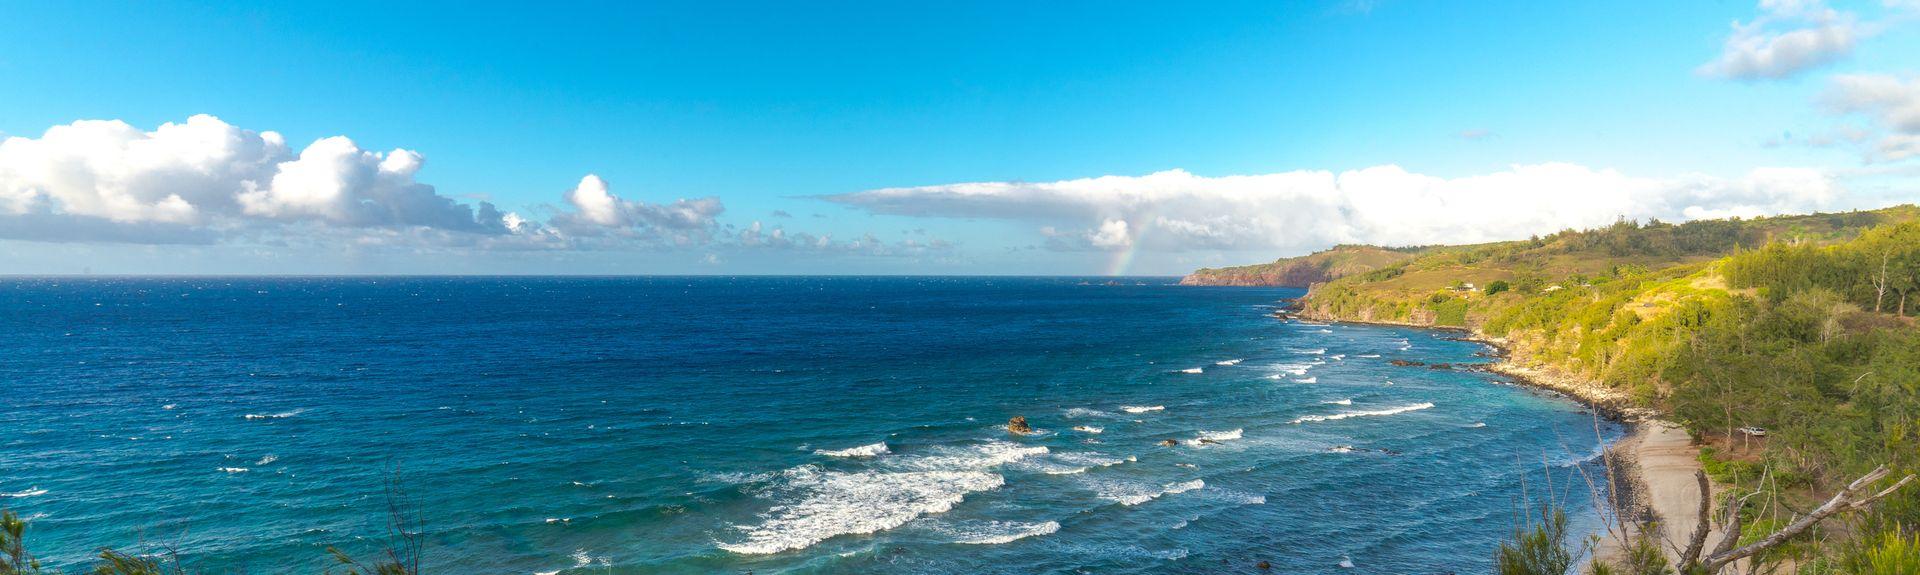 Hololani Resort (Kahana (Maui), Hawaï, Verenigde Staten)